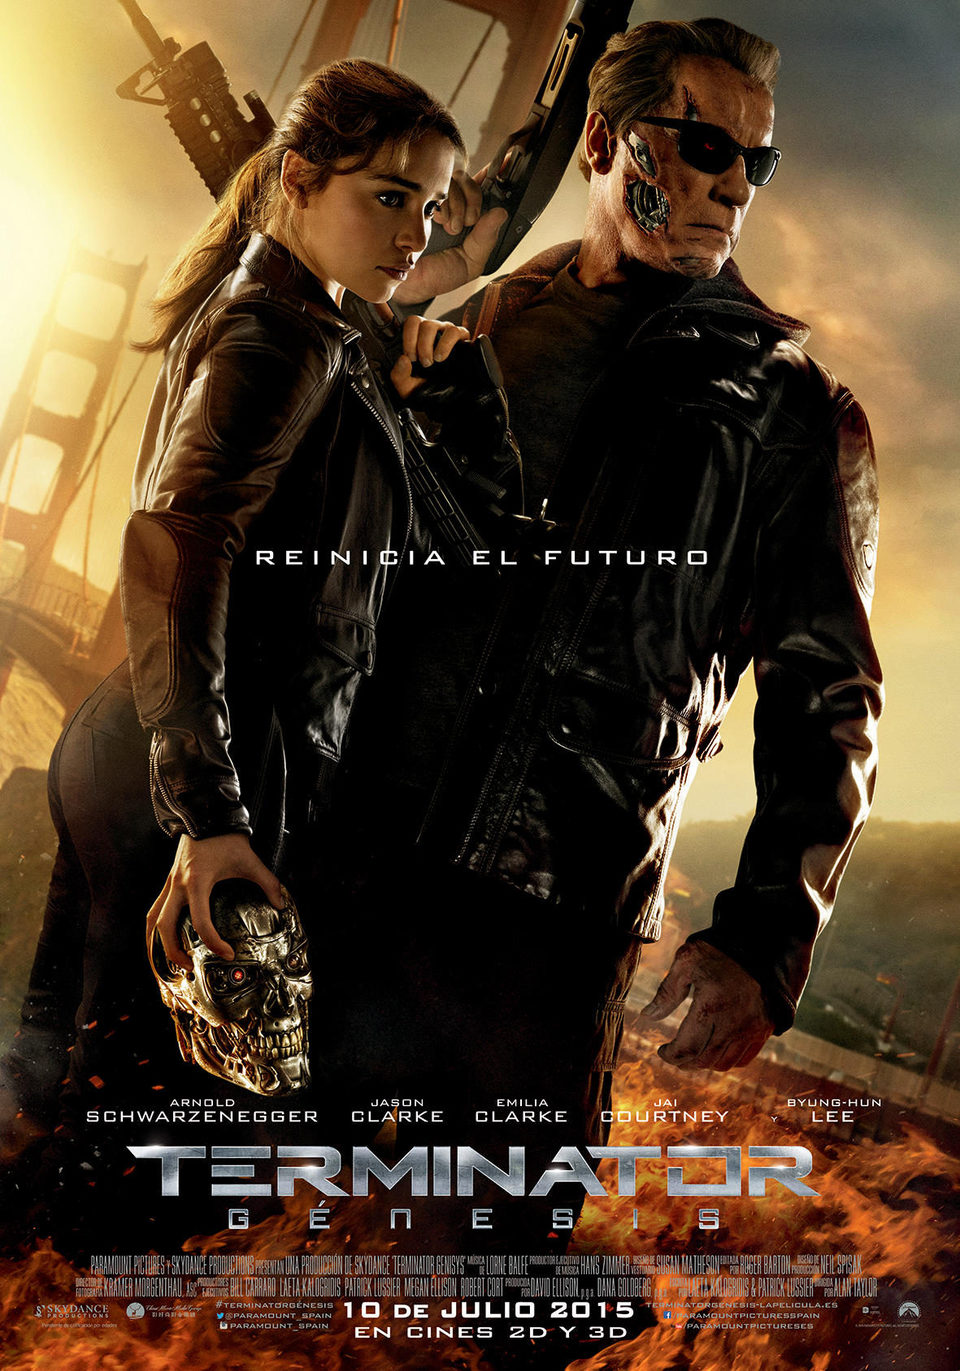 España poster for Terminator Genisys